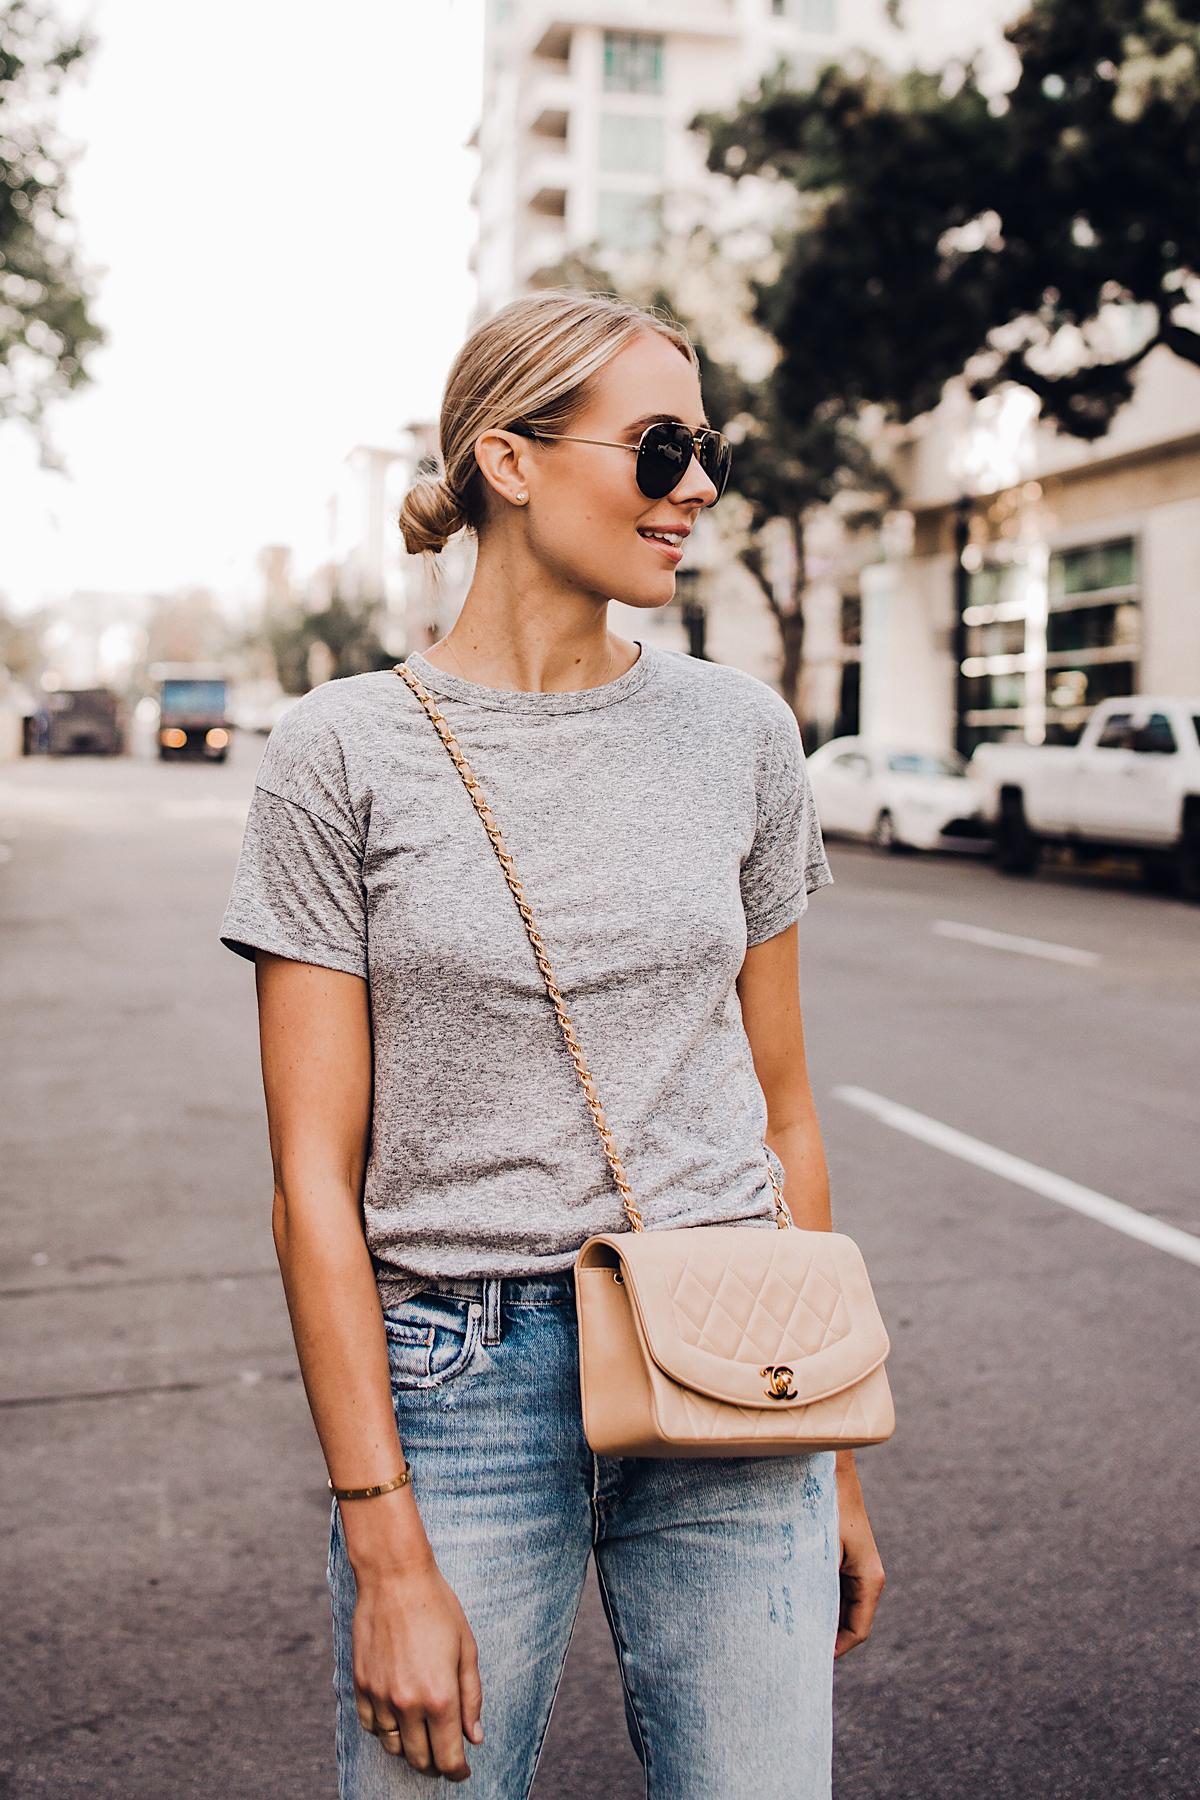 Blonde Woman Wearing Topshop Grey Tshirt Blanknyc Ripped Jeans Chanel Quilted Tan Handbag Celine Aviator Sunglasses Fashion Jackson San Diego Blogger Fashion Blogger Street Style